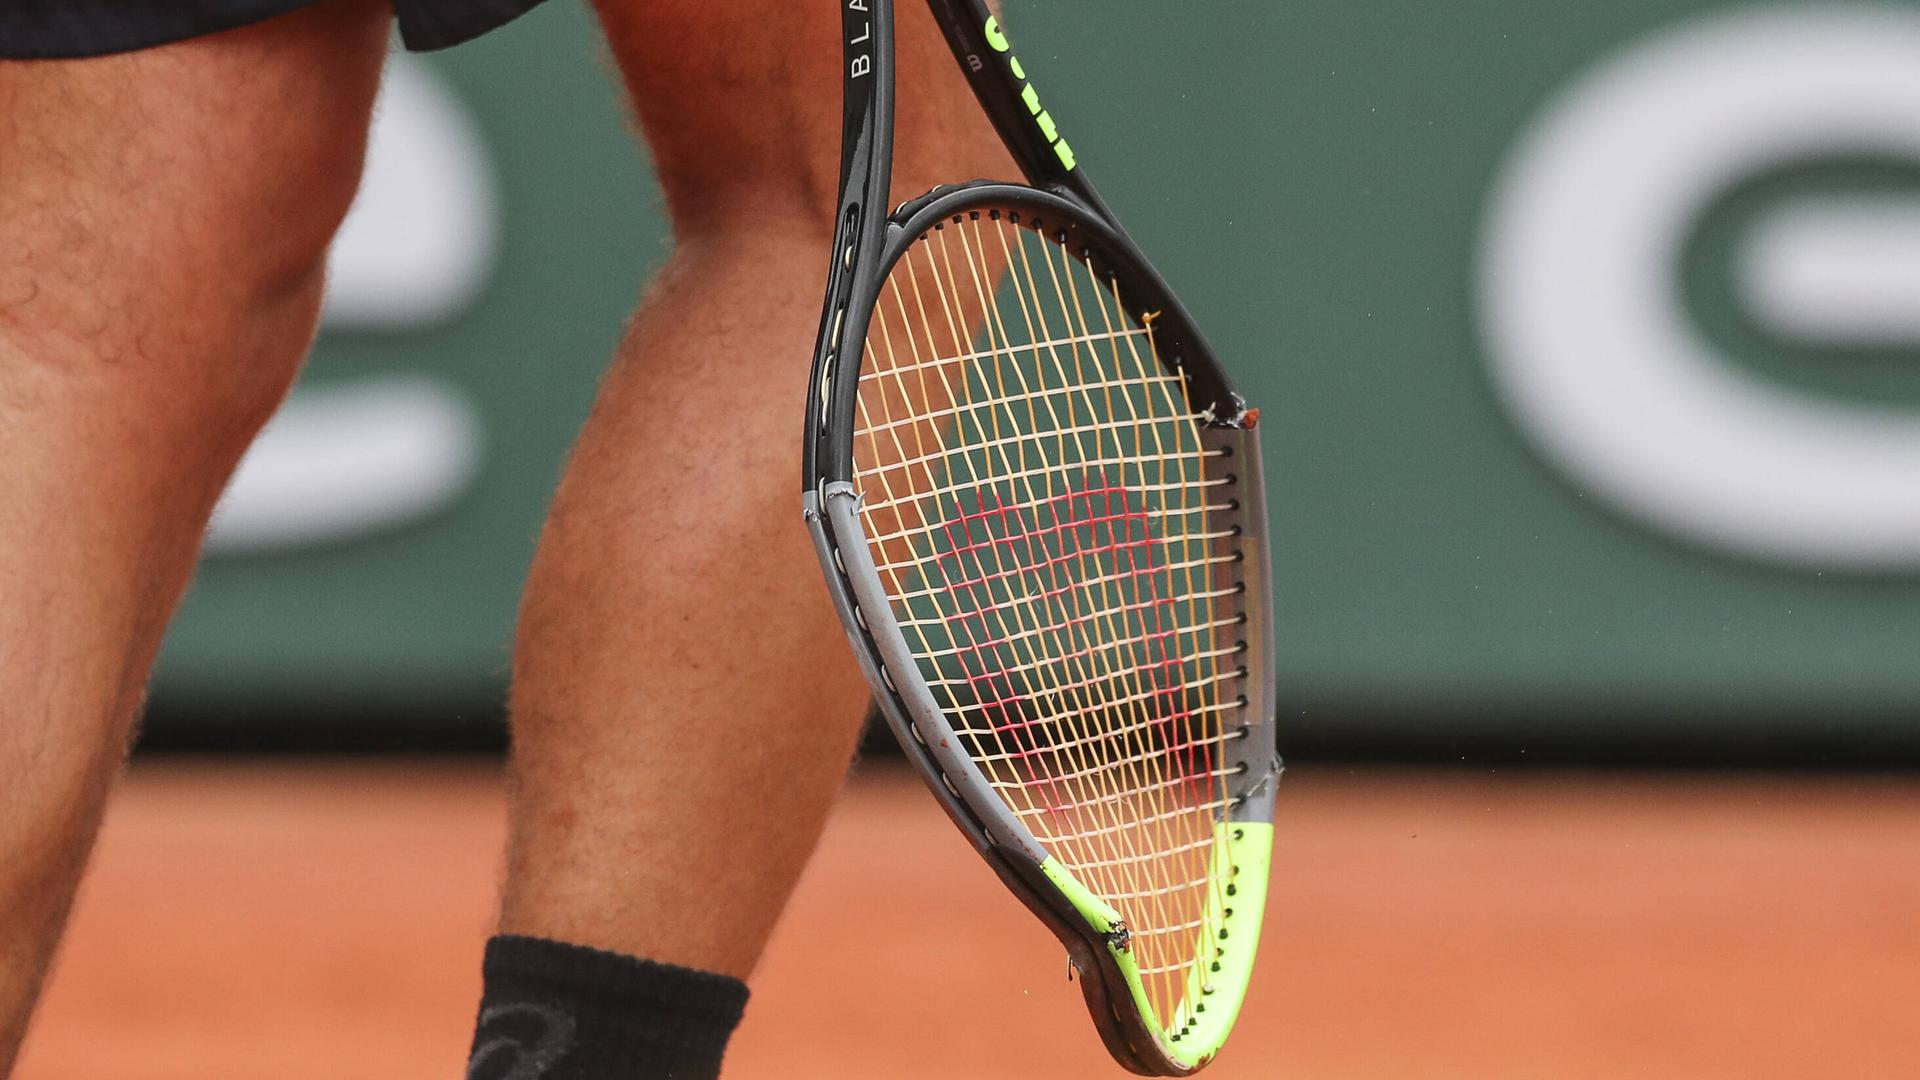 TENNIS - ATP, Tennis Herren French Open 2020 PARIS,FRANCE,29.SEP.20 - TENNIS - ATP World Tour, French Open, Roland Garros, Grand Slam. Image shows a feature of the broken racket of Vasek Pospisil CAN. PUBLICATIONxINxGERxHUNxONLY GEPAxpictures/xPatrickxSteiner